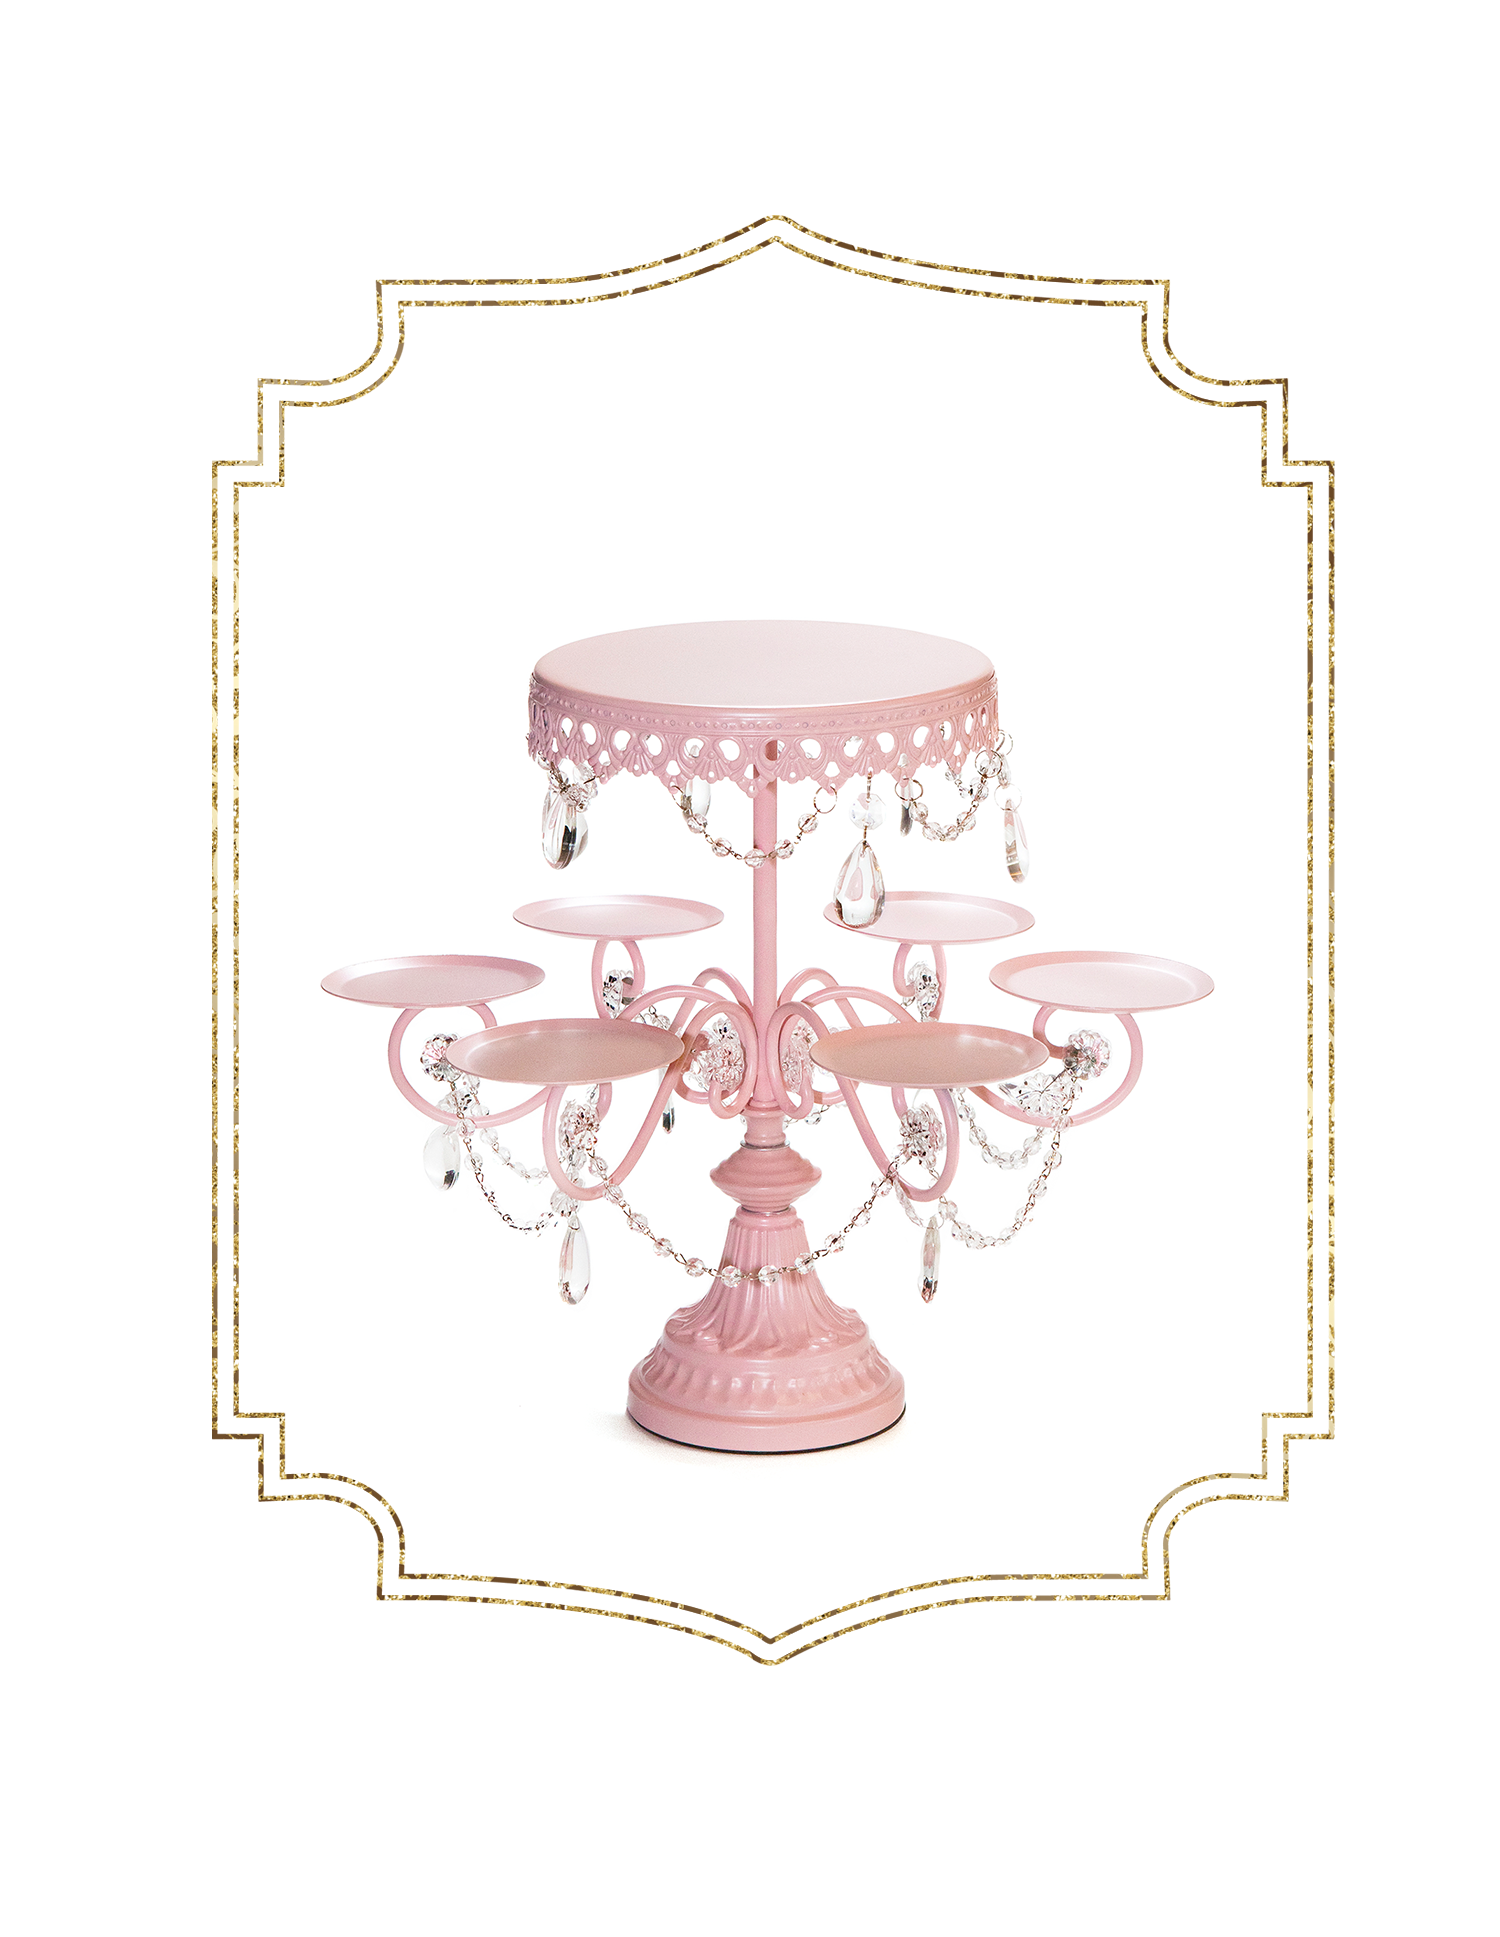 SHOP-preview PINK rosebud dessert stand.png